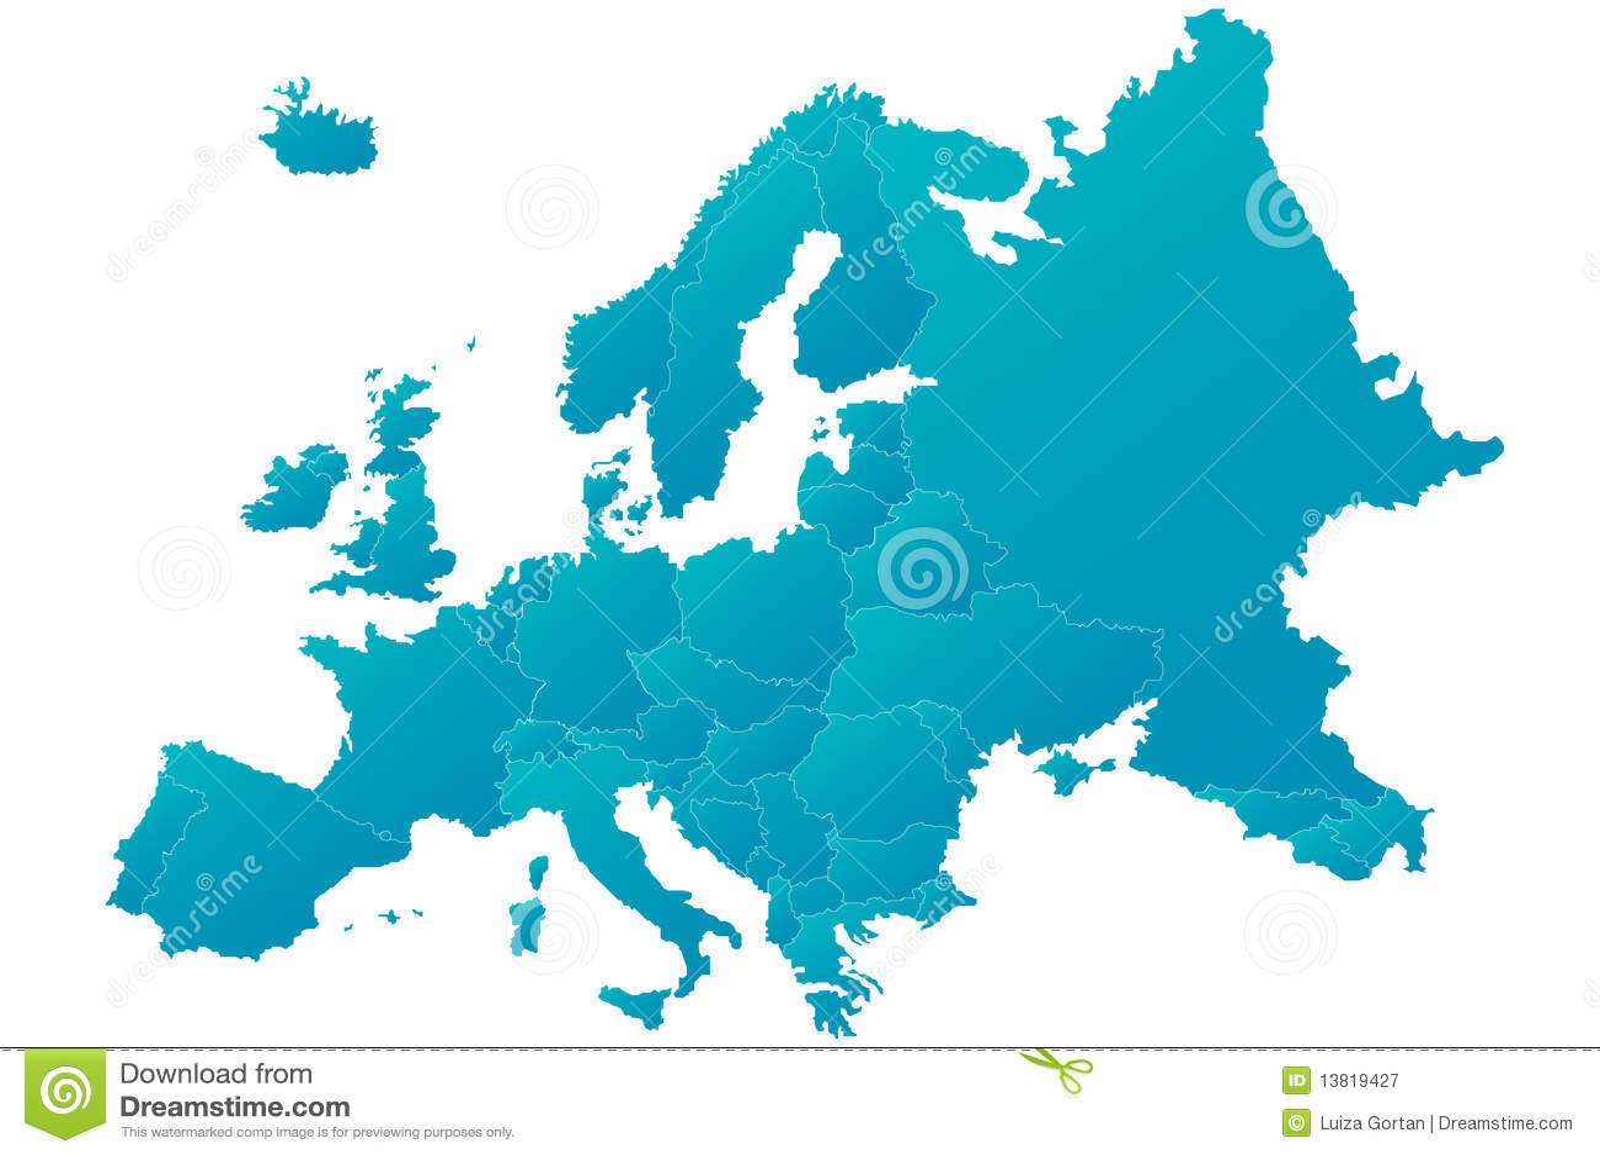 in hohem grade ausf hrliche blaue europa karte lizenzfreie stockfotografie bild 13819427. Black Bedroom Furniture Sets. Home Design Ideas